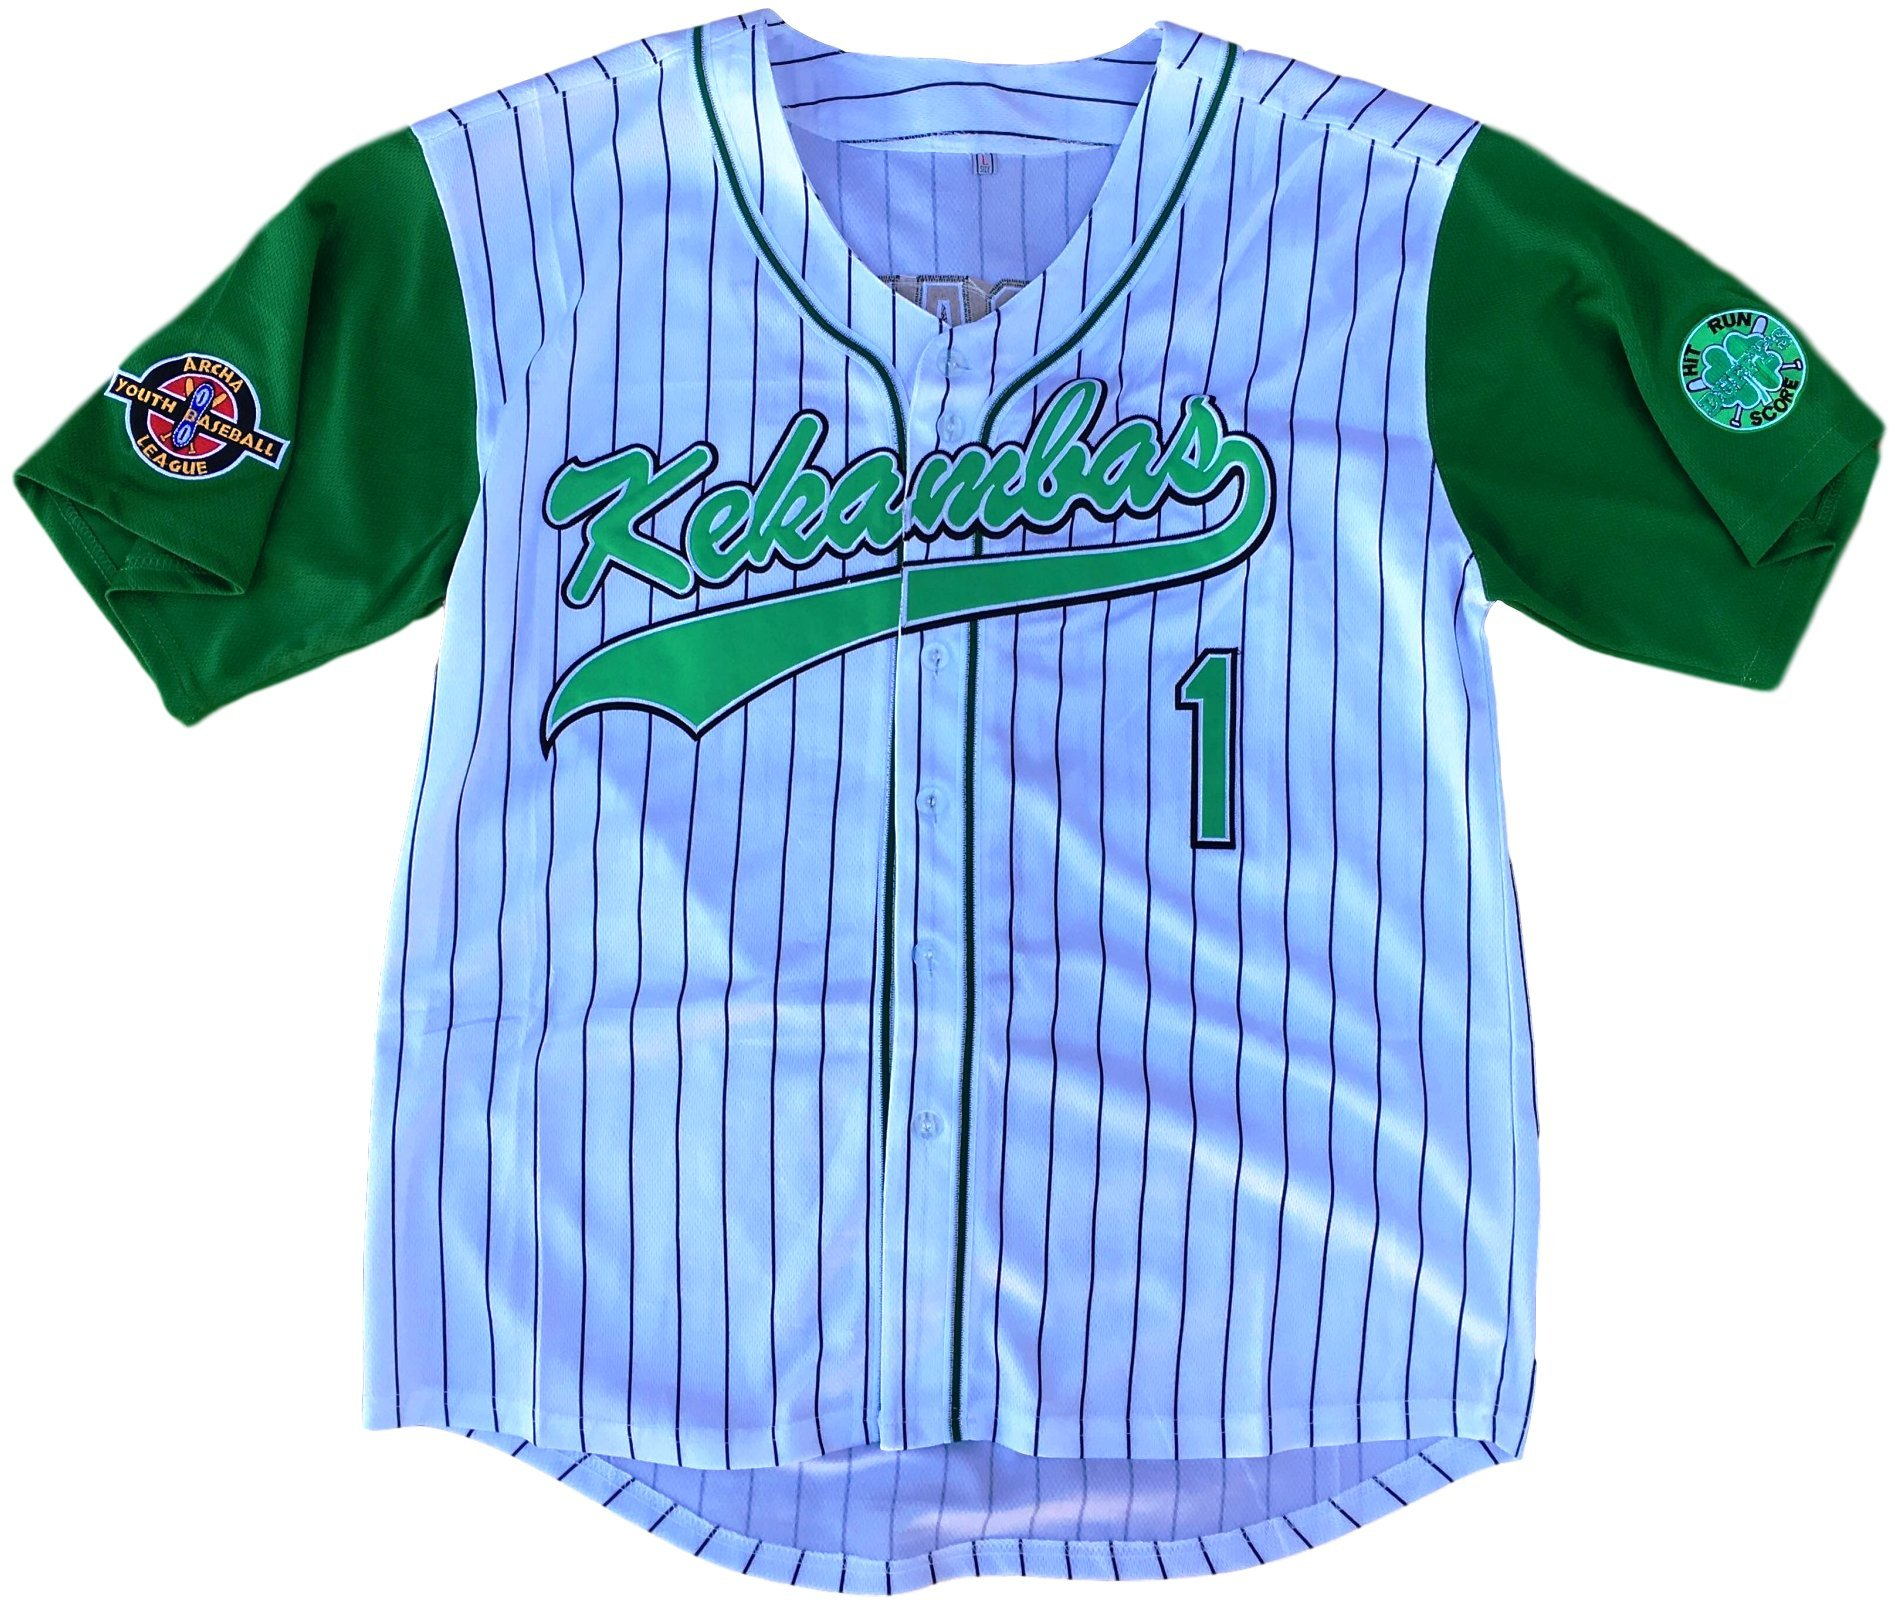 MVG ATHLETICS G-Baby Hardball Kekambas Movie Baseball Jersey #1 Embroidered S-XXL (Large) by MVG ATHLETICS